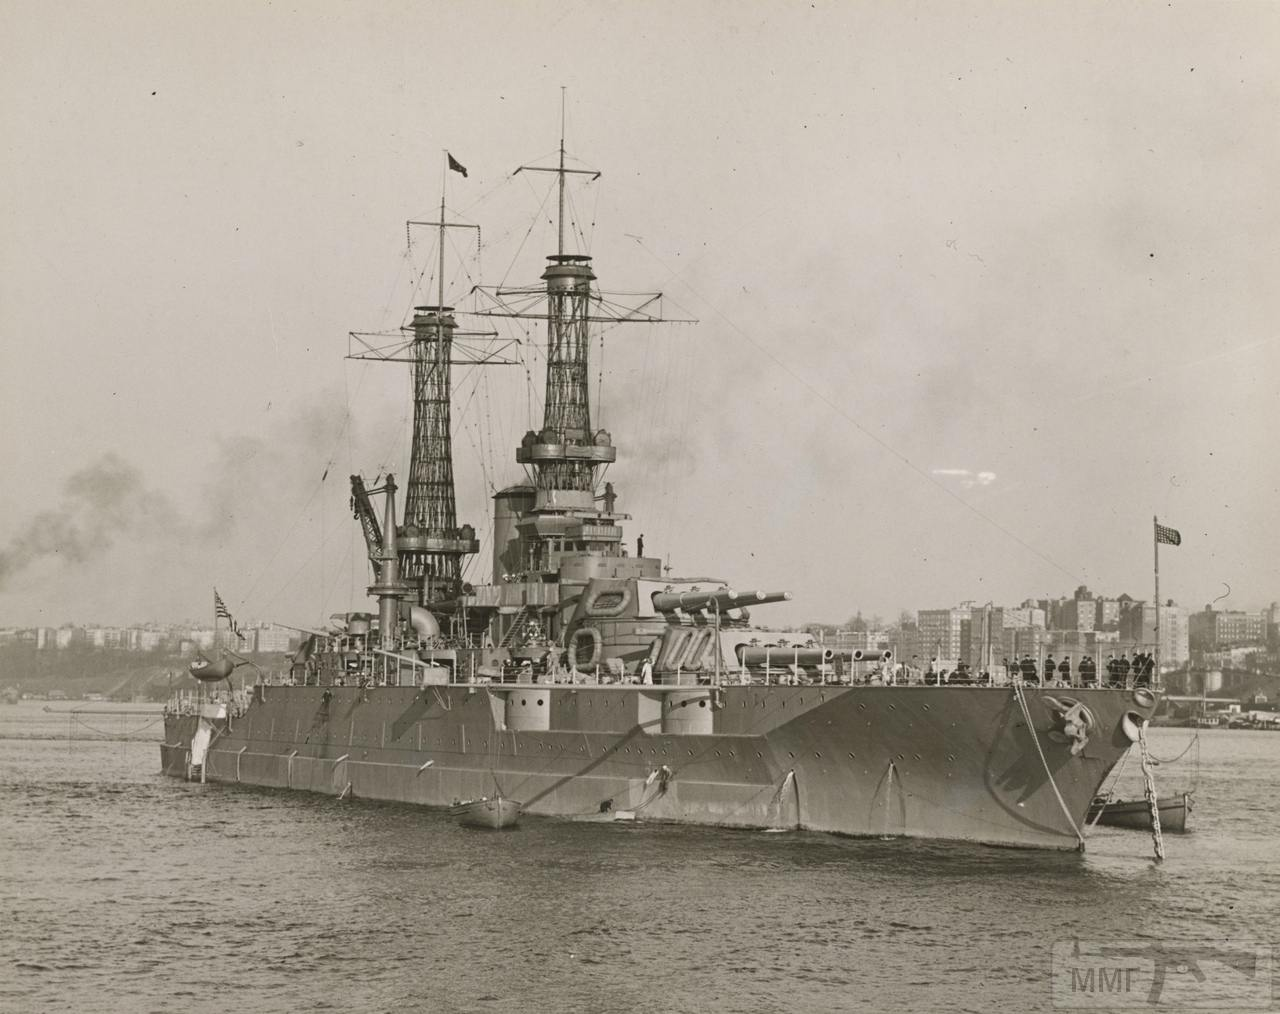 89529 - USS Mississippi (BB-41)